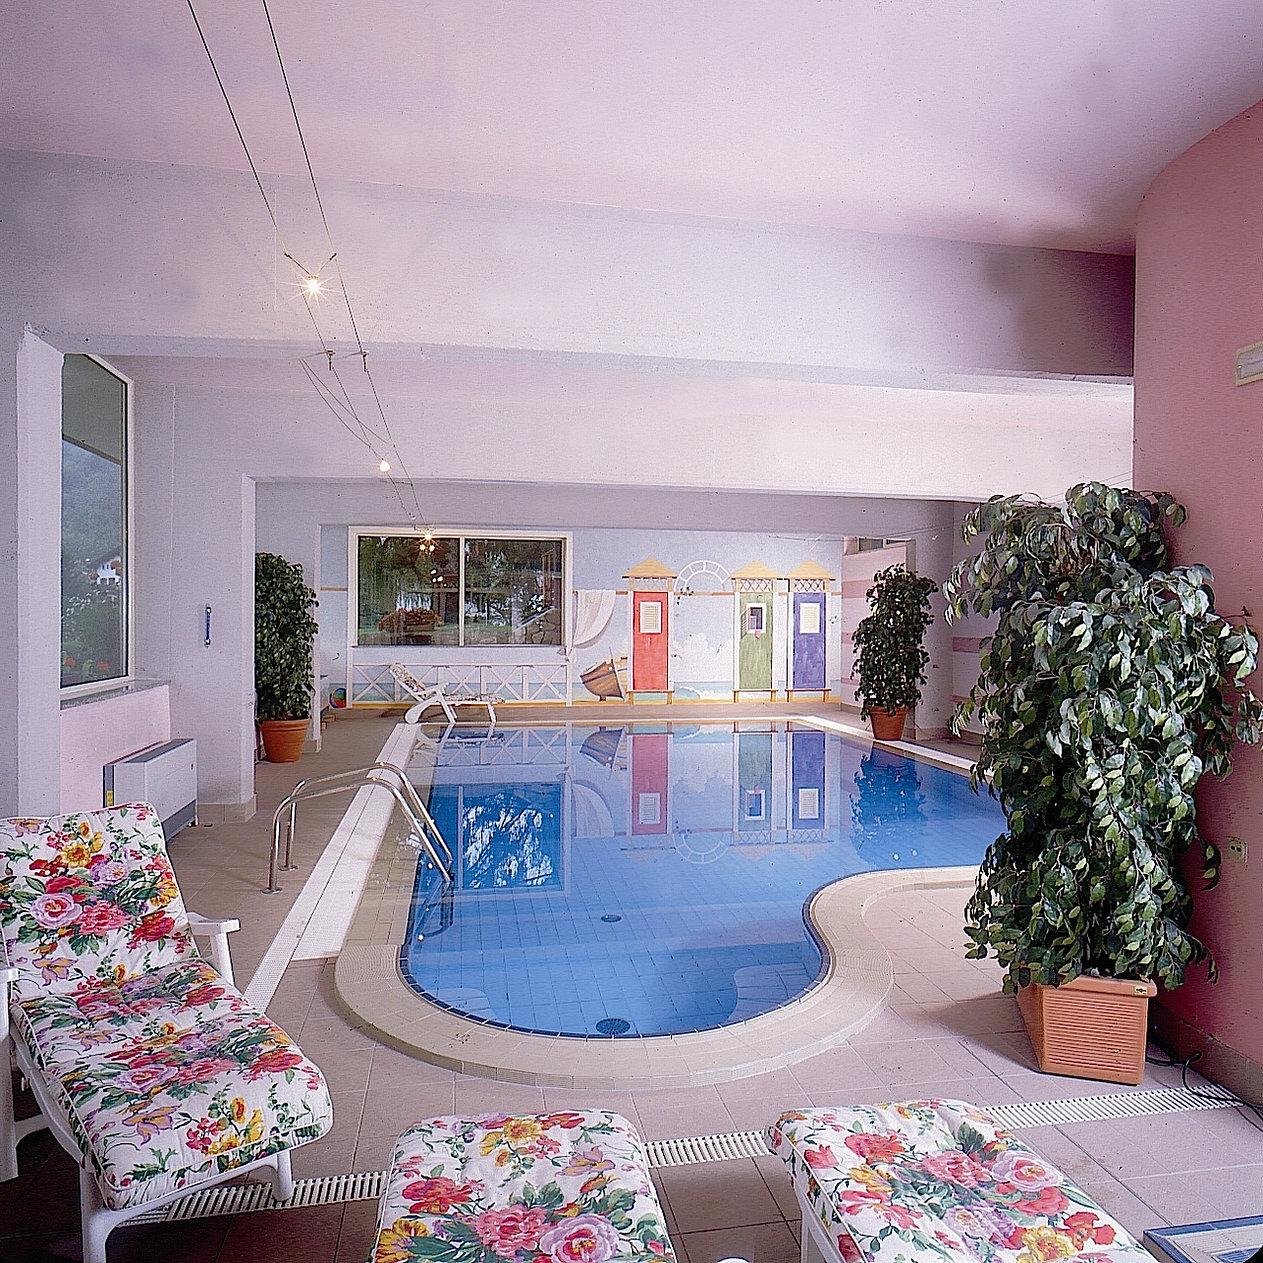 Hotel catinaccio rosengarten moena dolomiti massaggi e - Hotel moena piscina ...